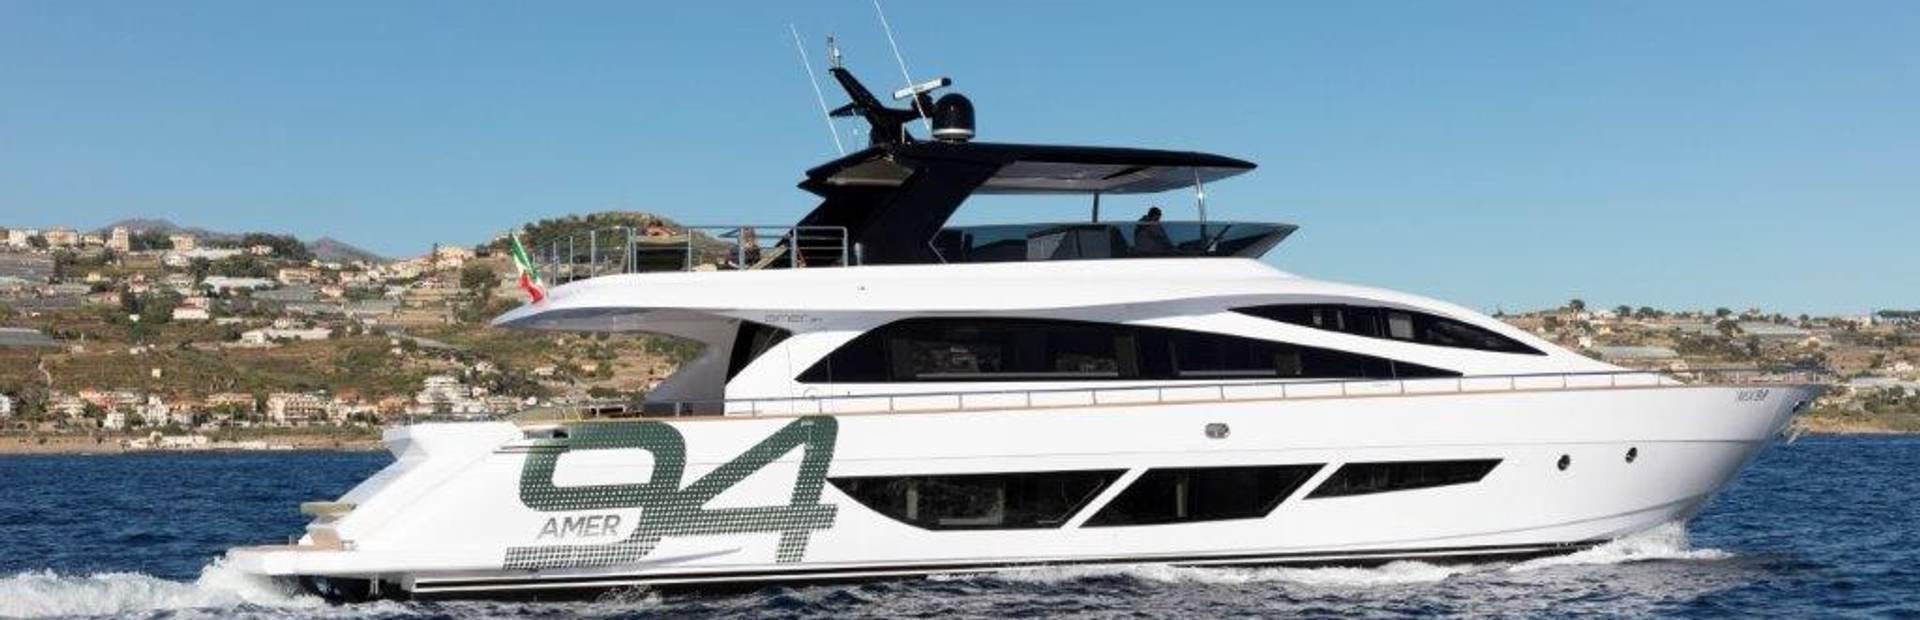 Amer 94 Twin Yacht Charter